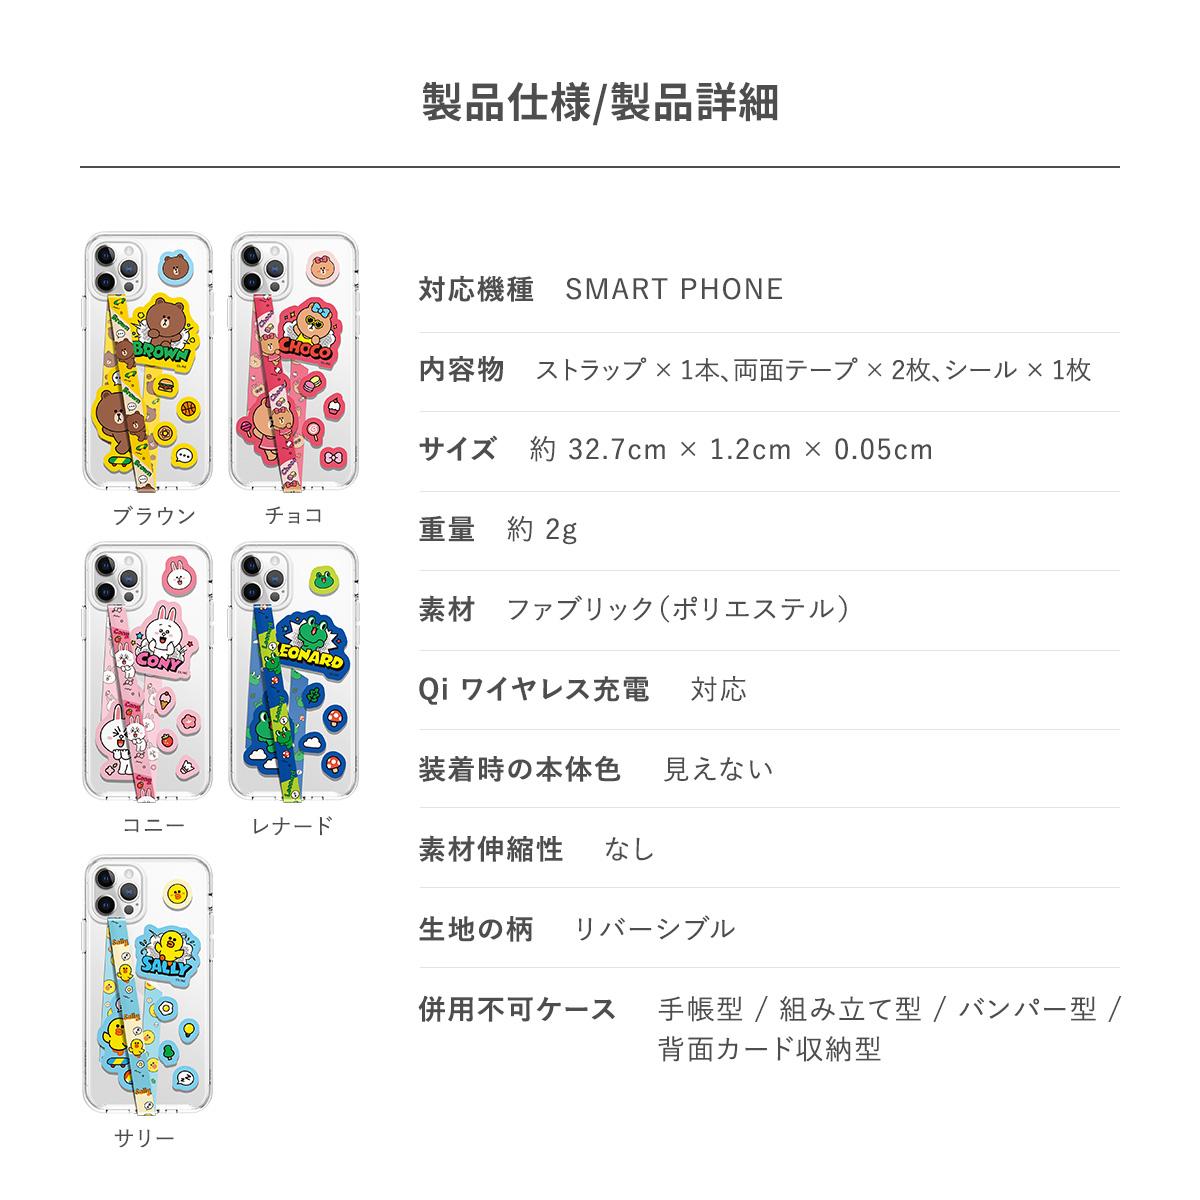 elago LINE FRIENDS COLLABORATION B&F PHONE STRAP for SMART PHONE